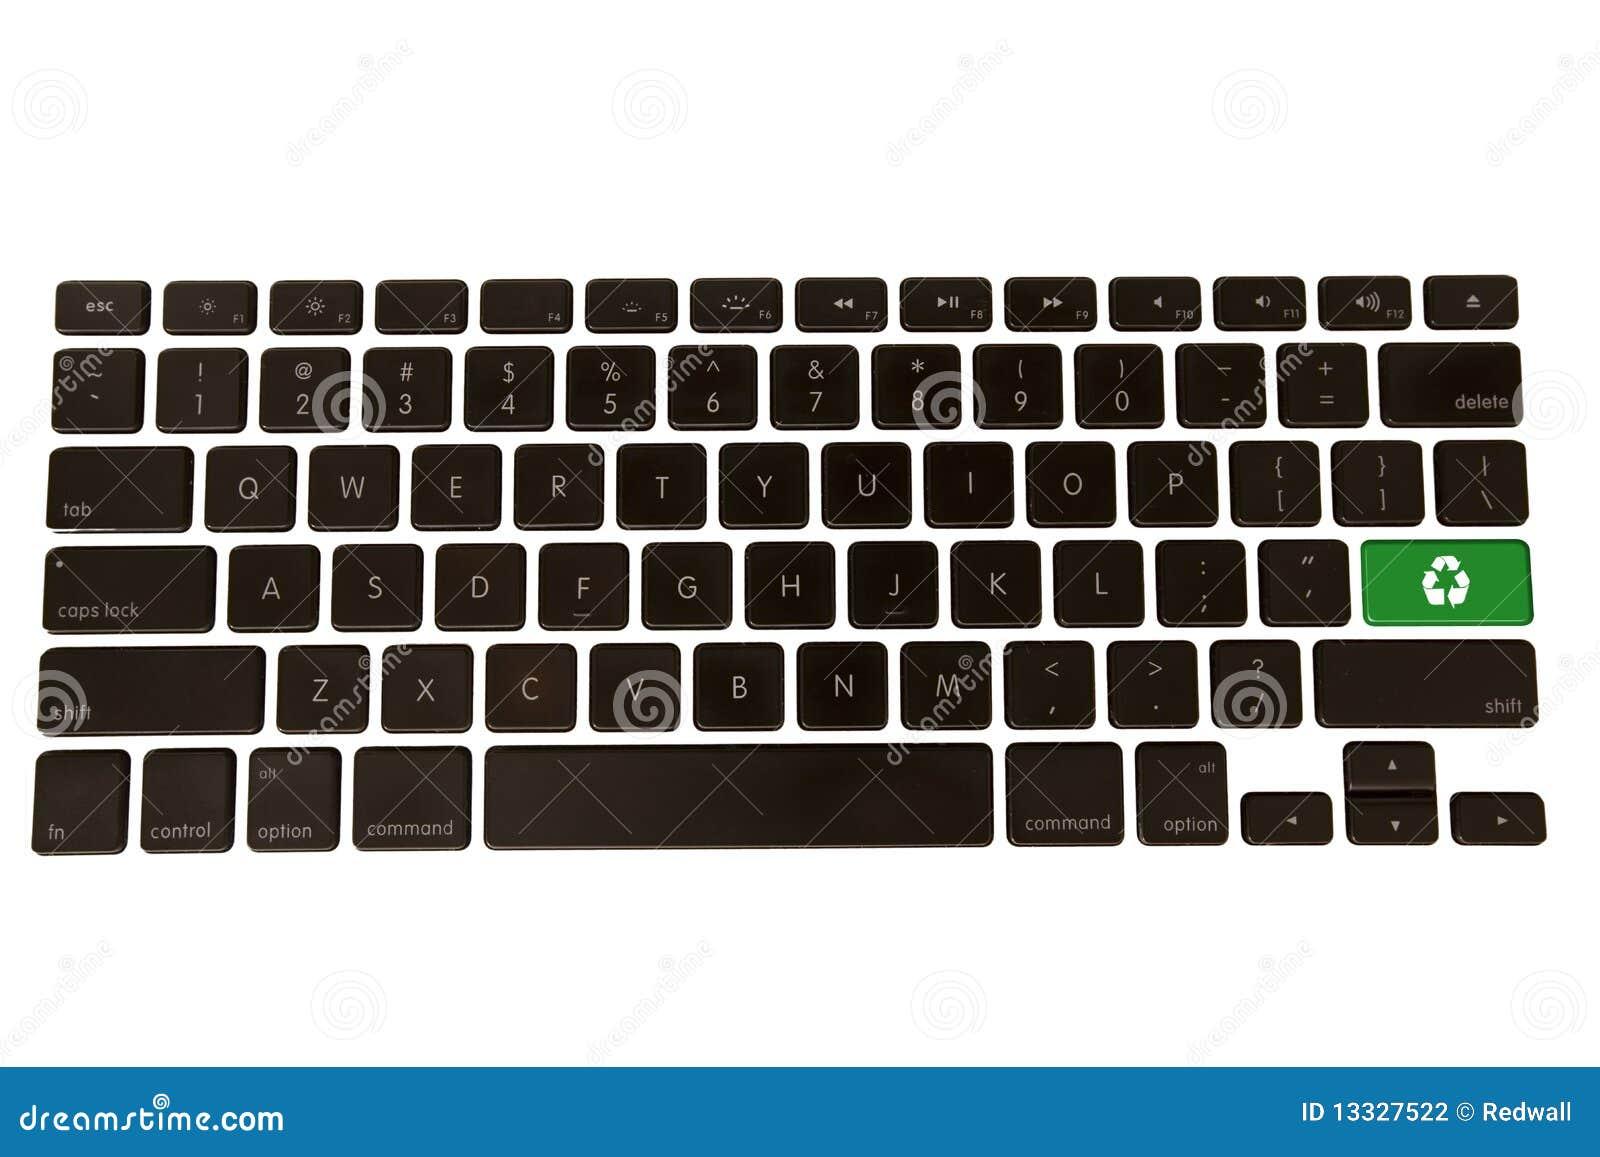 Green Environment Symbol On Keyboard Stock Photo Image Of